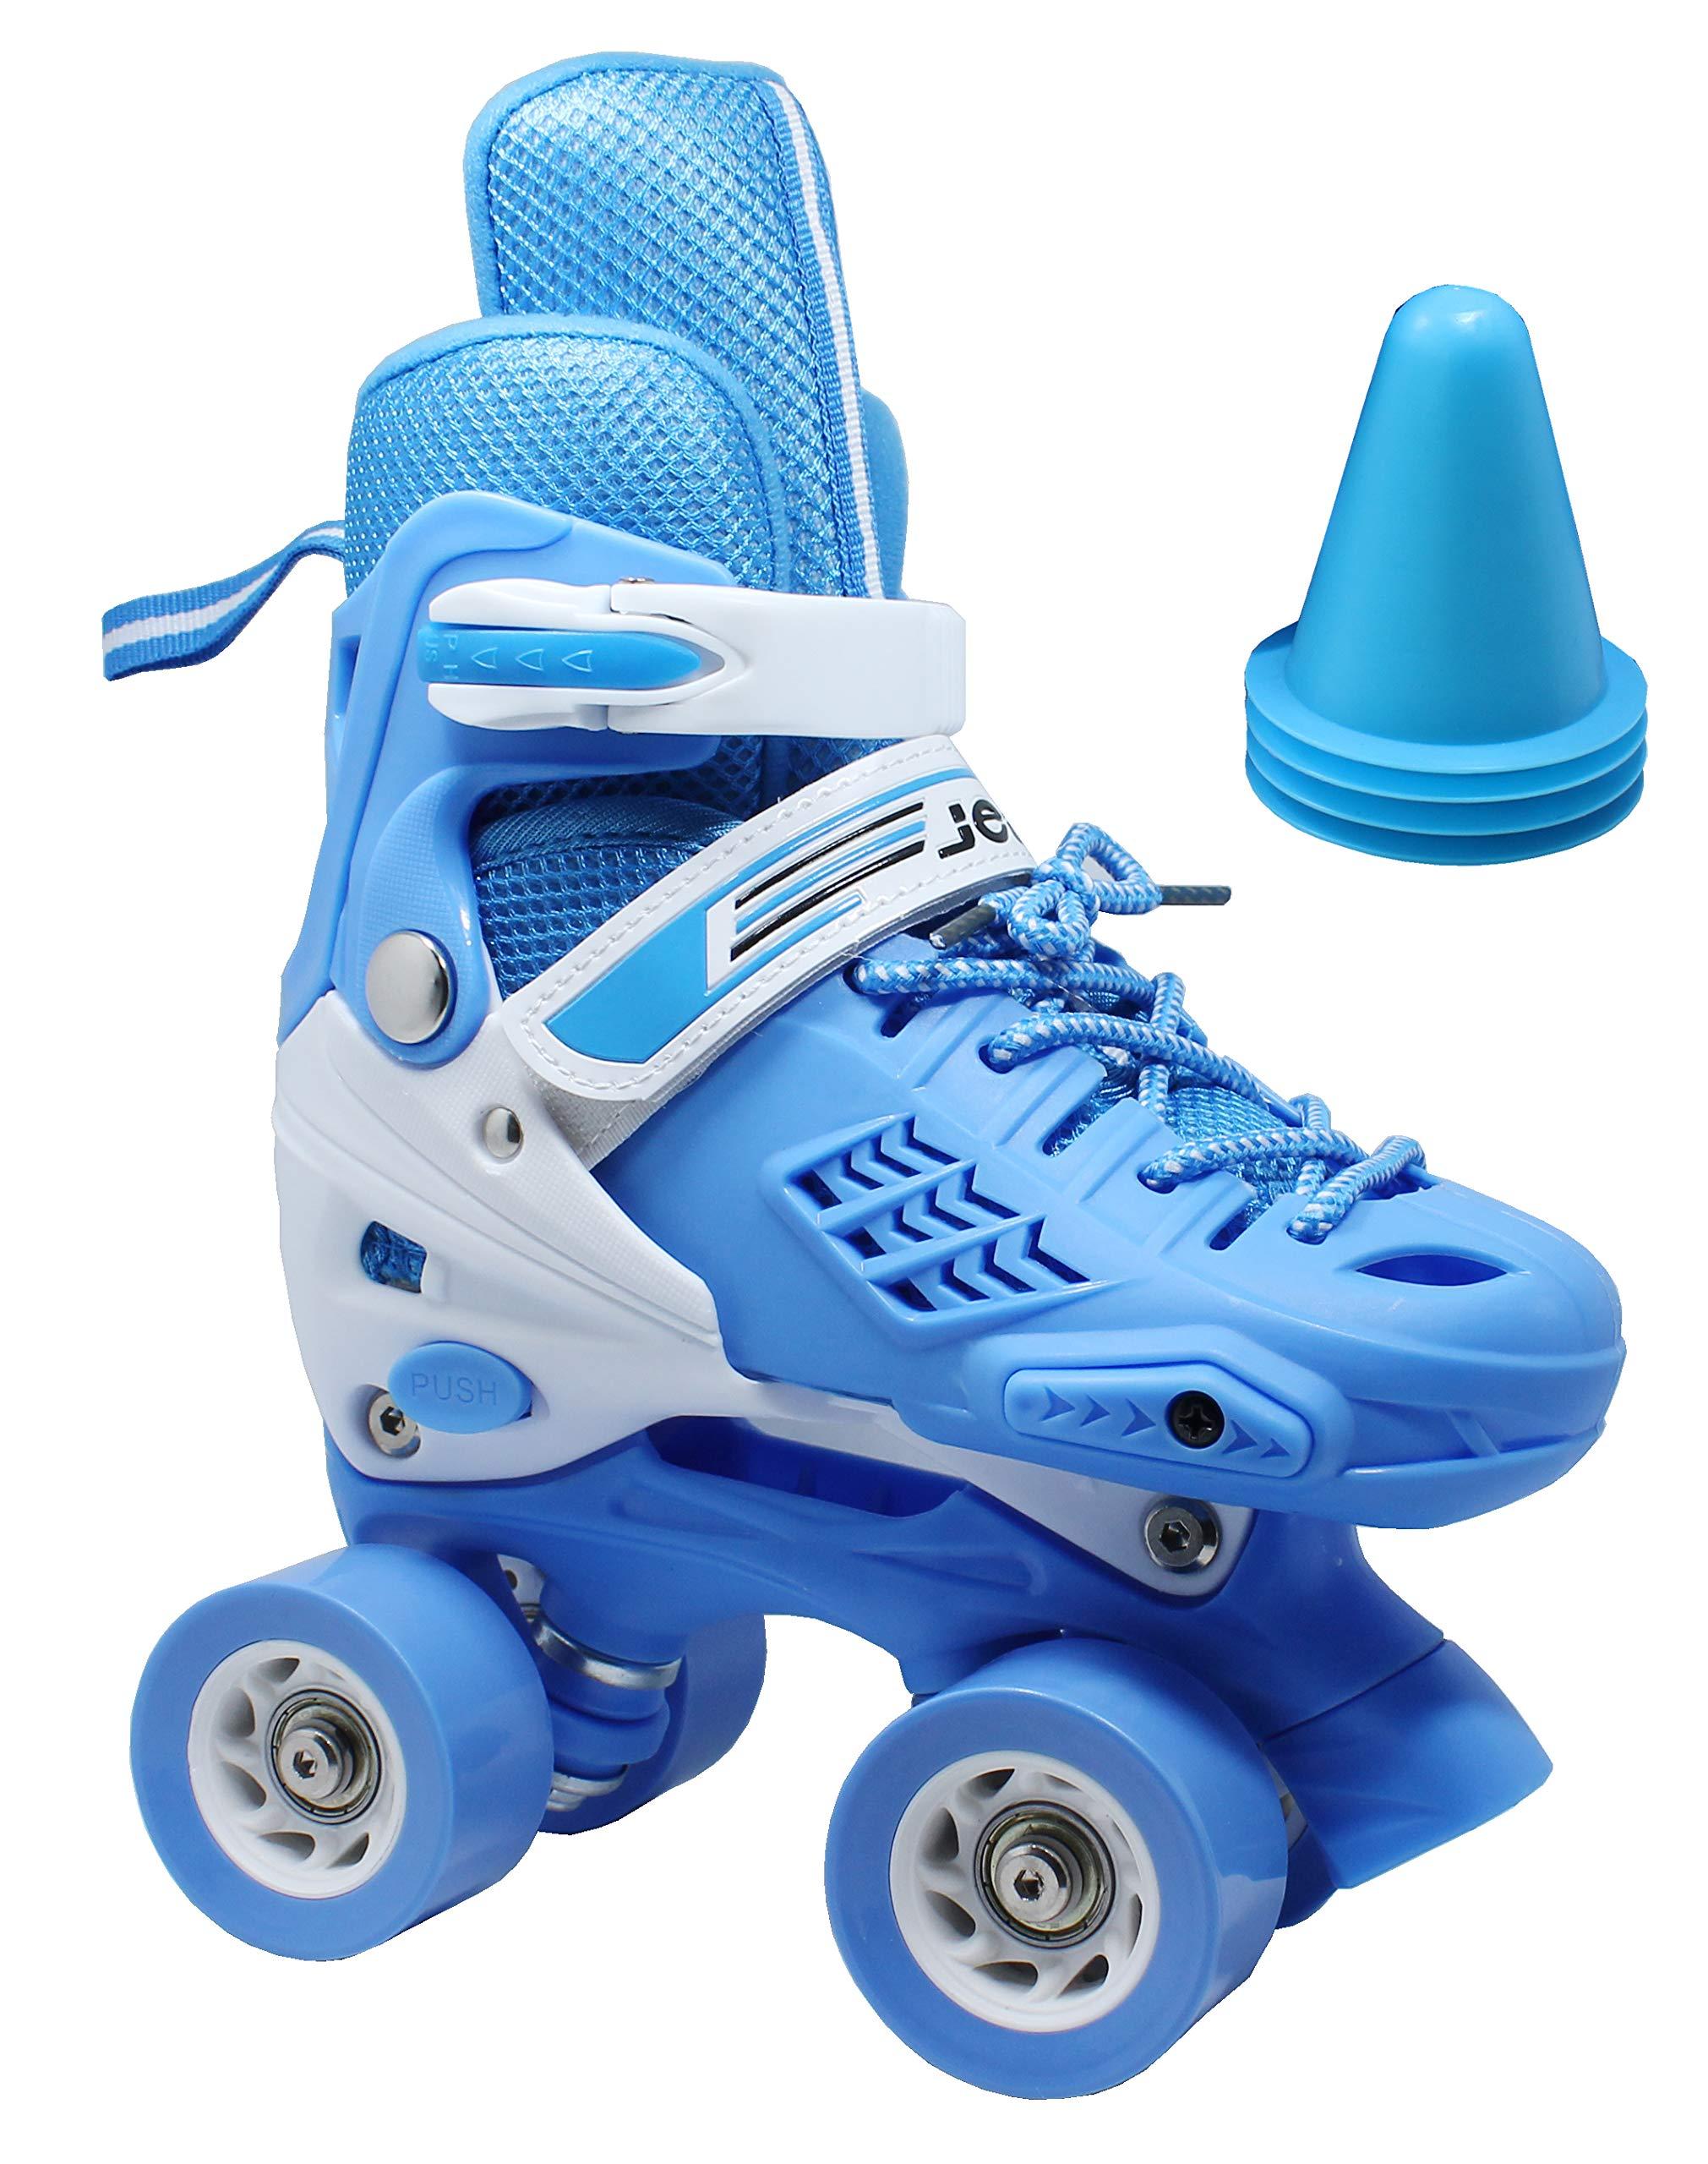 WiiSHAM Adjustable Children's Roller Skates with Four Piles by WiiSHAM